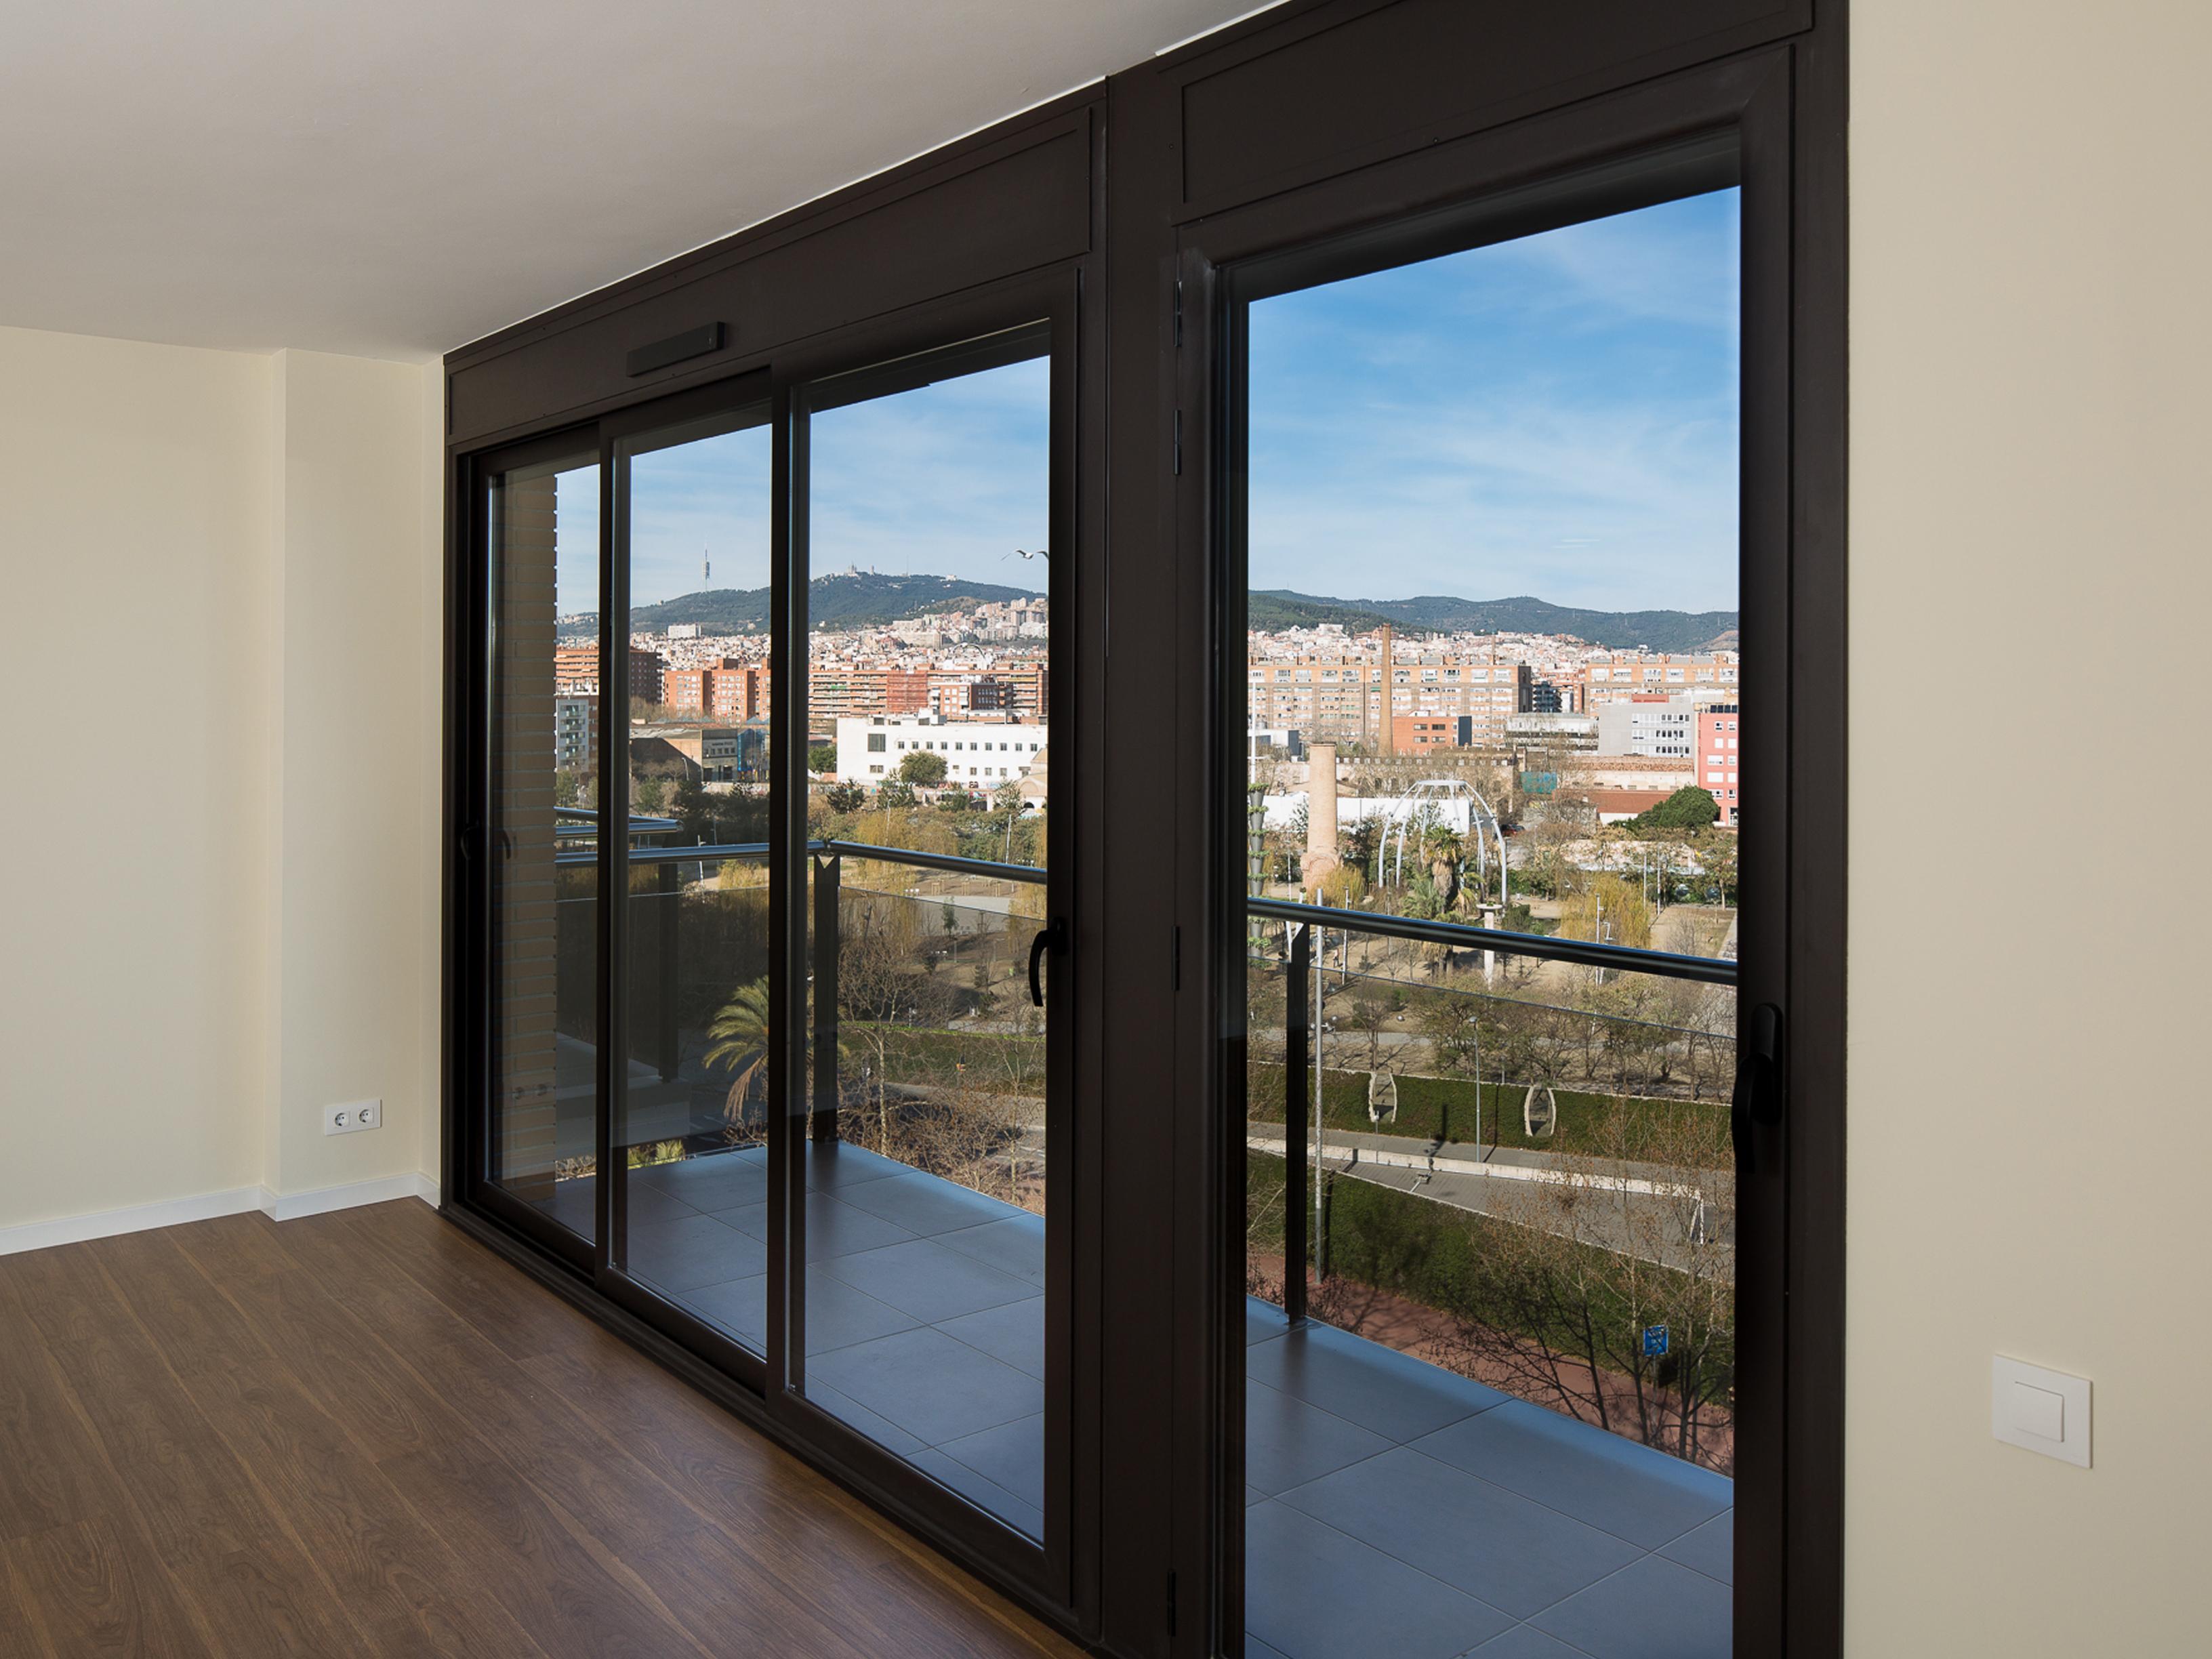 pisos de obra nueva en poble nou barcelona farr